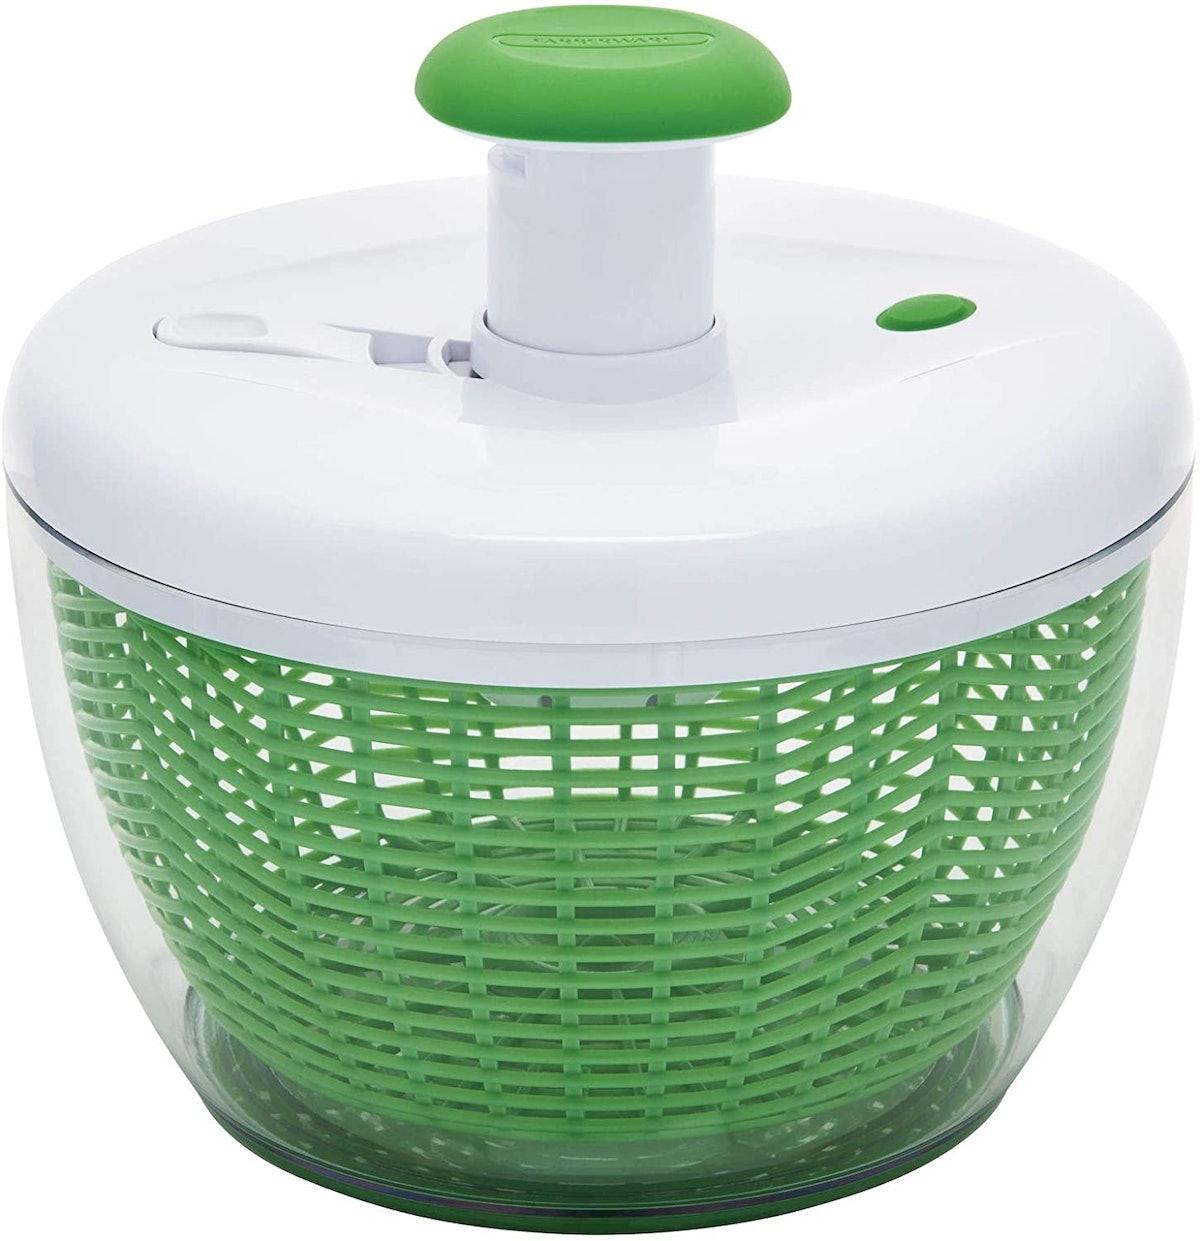 Farberware Salad Spinner Bowl